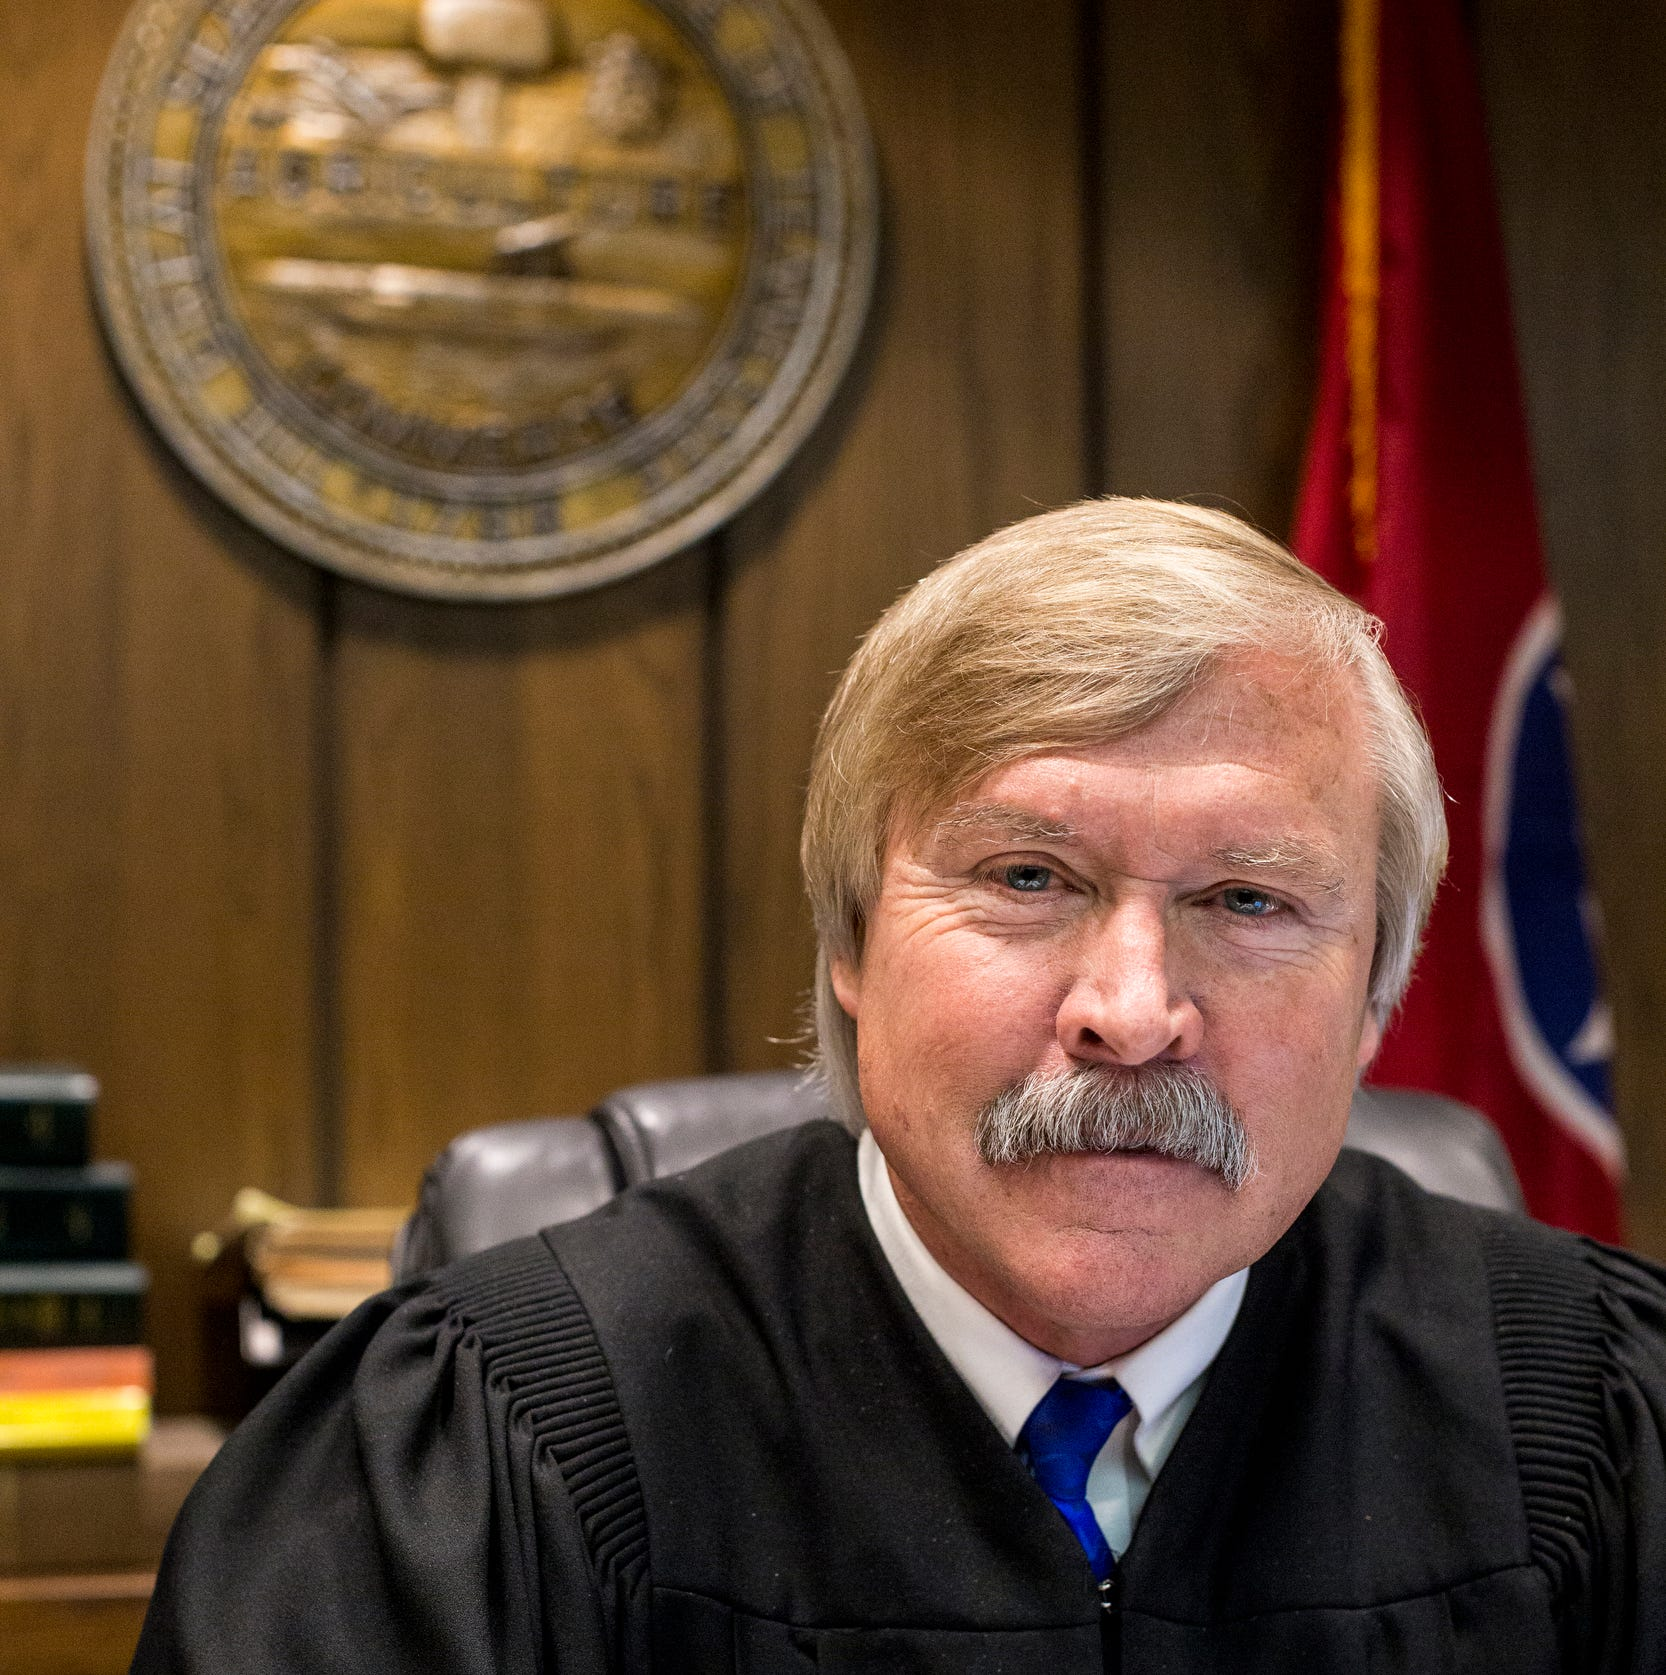 Memphis judge posts Facebook link to Holocaust denier's essay calling immigrants 'foreign mud'